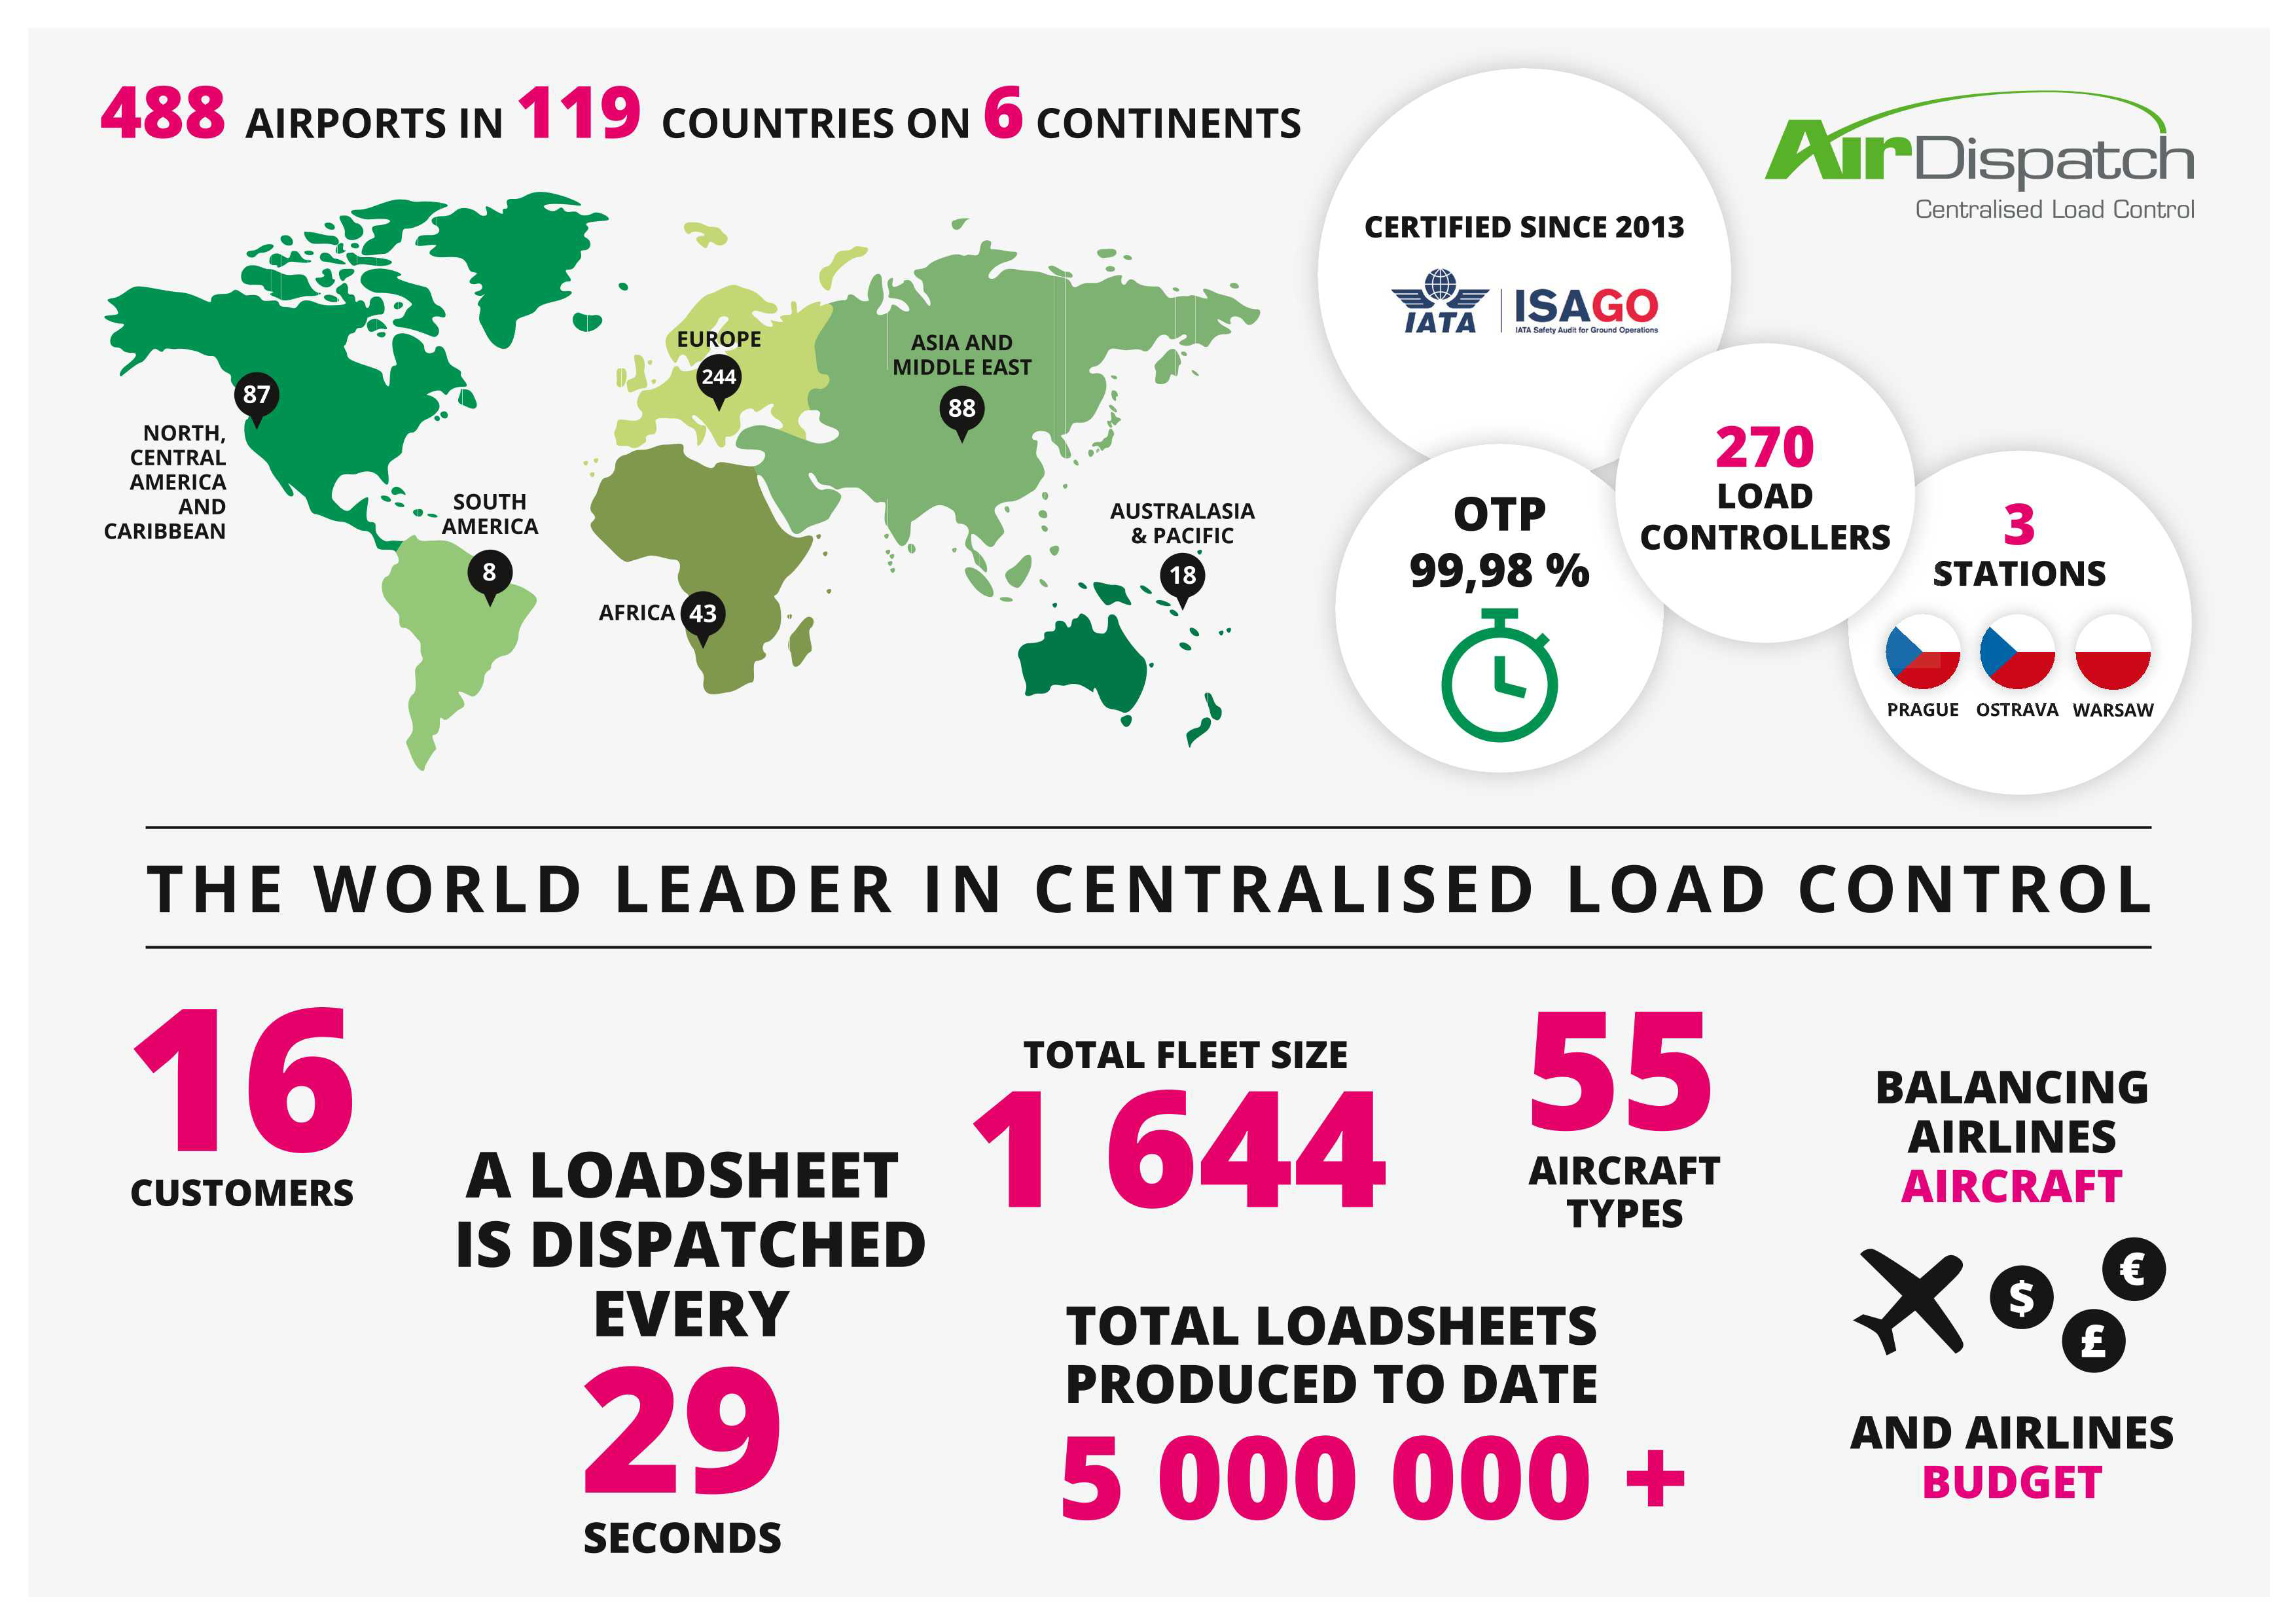 Air Dispatch produces 5 millionth loadsheet